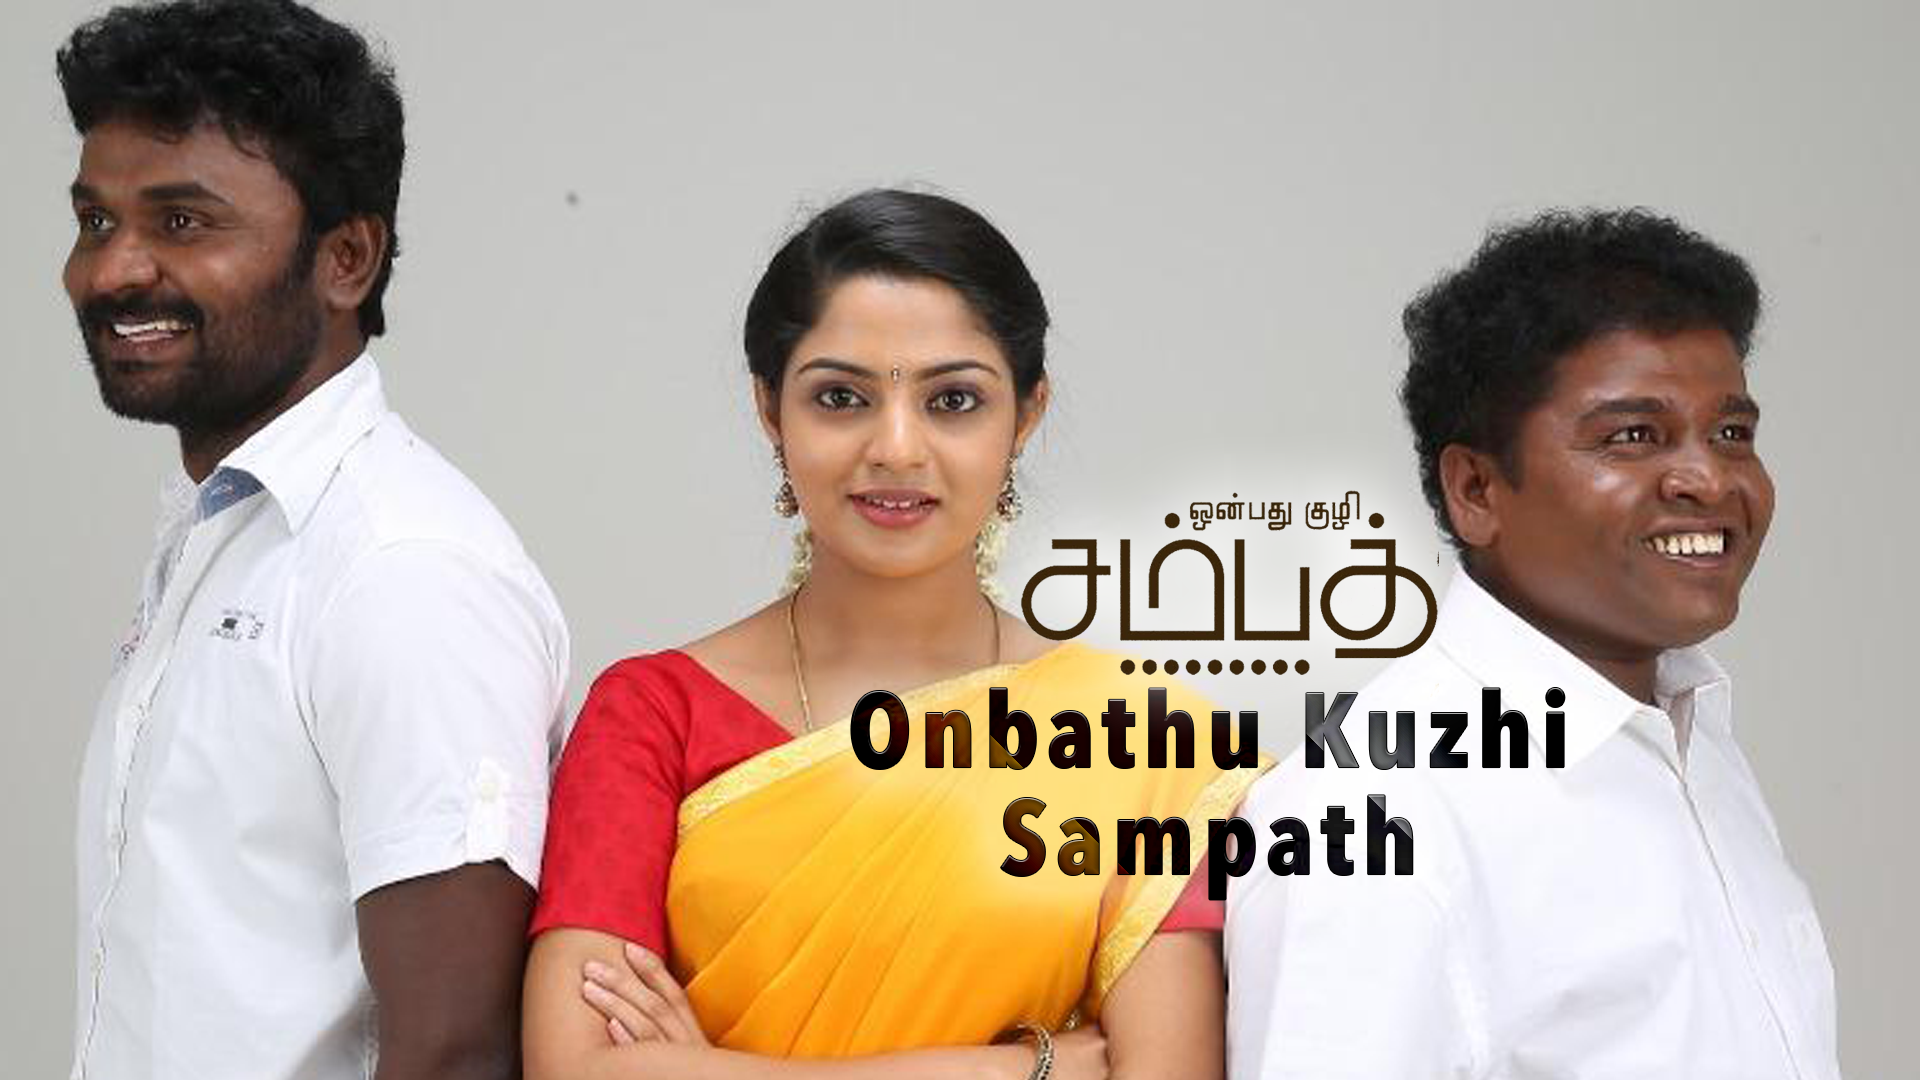 Onbathu Kuzhi Sampath